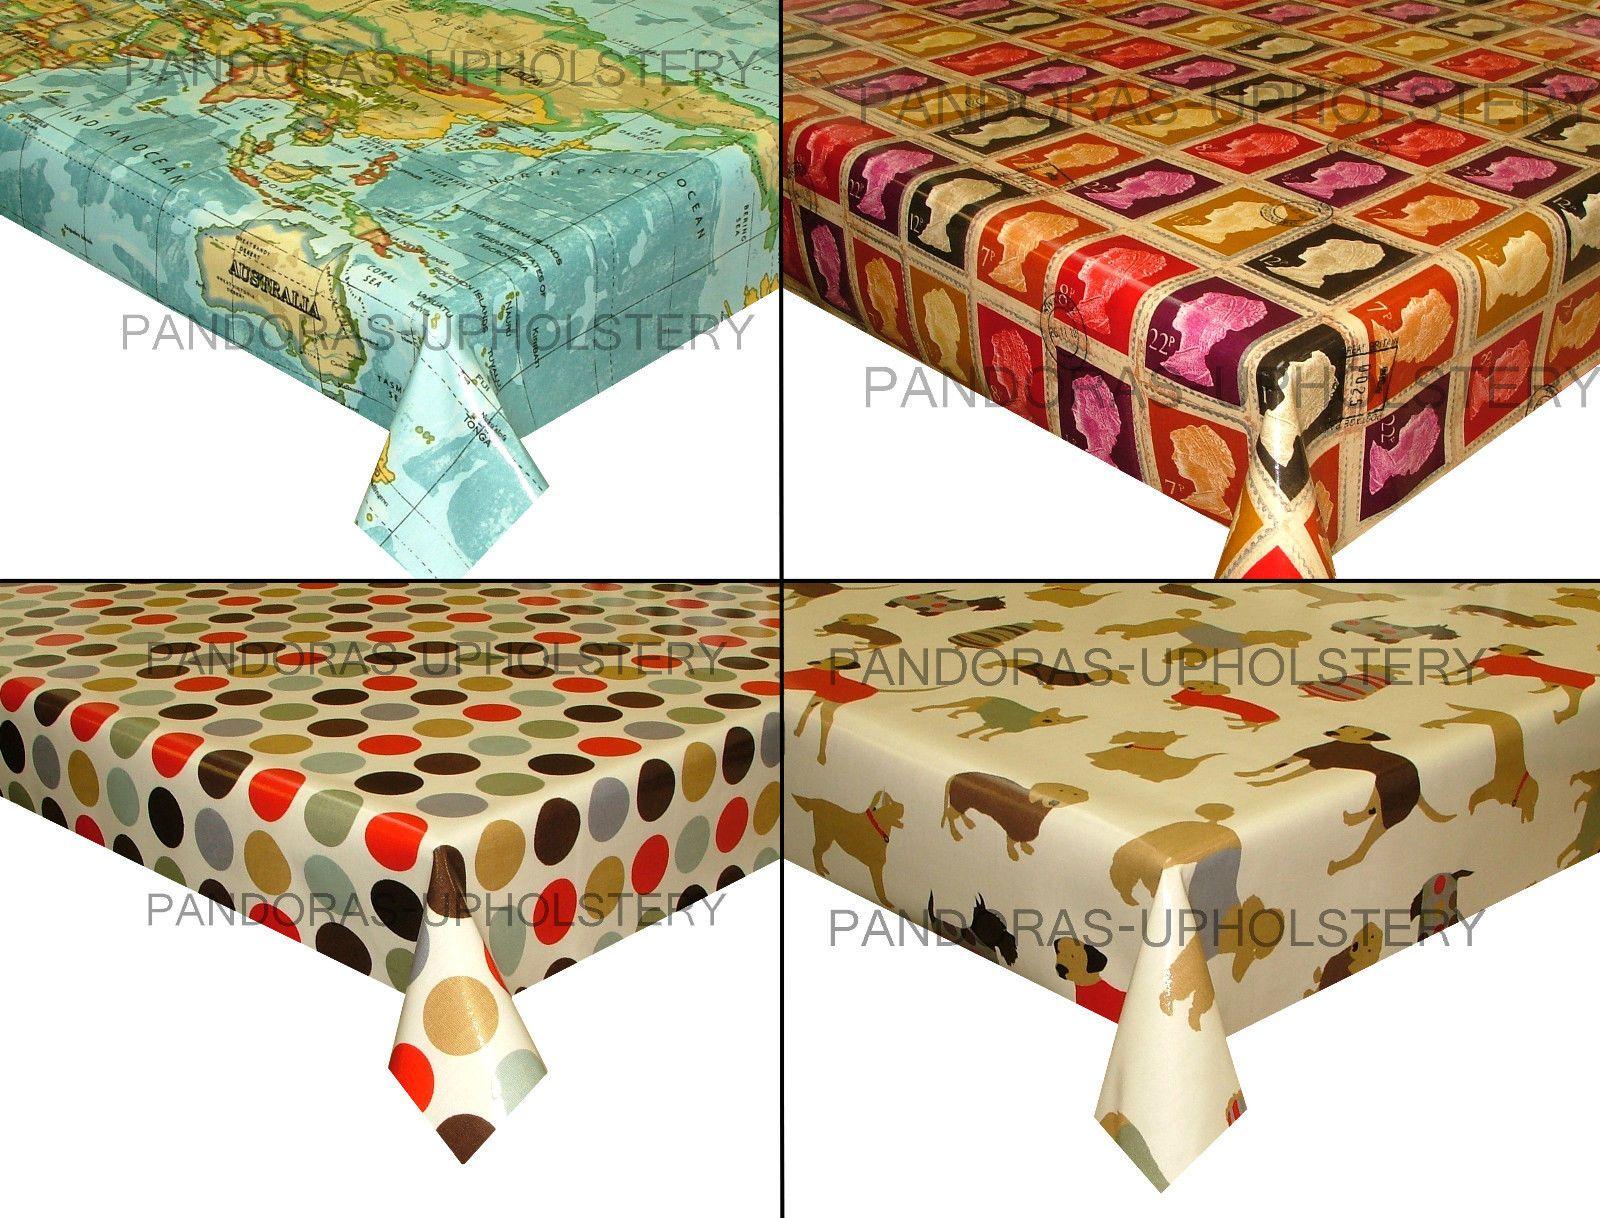 Prestigious Textiles Designer PVC VINYL FABRIC WIPE CLEAN OILCLOTH  TABLECLOTH